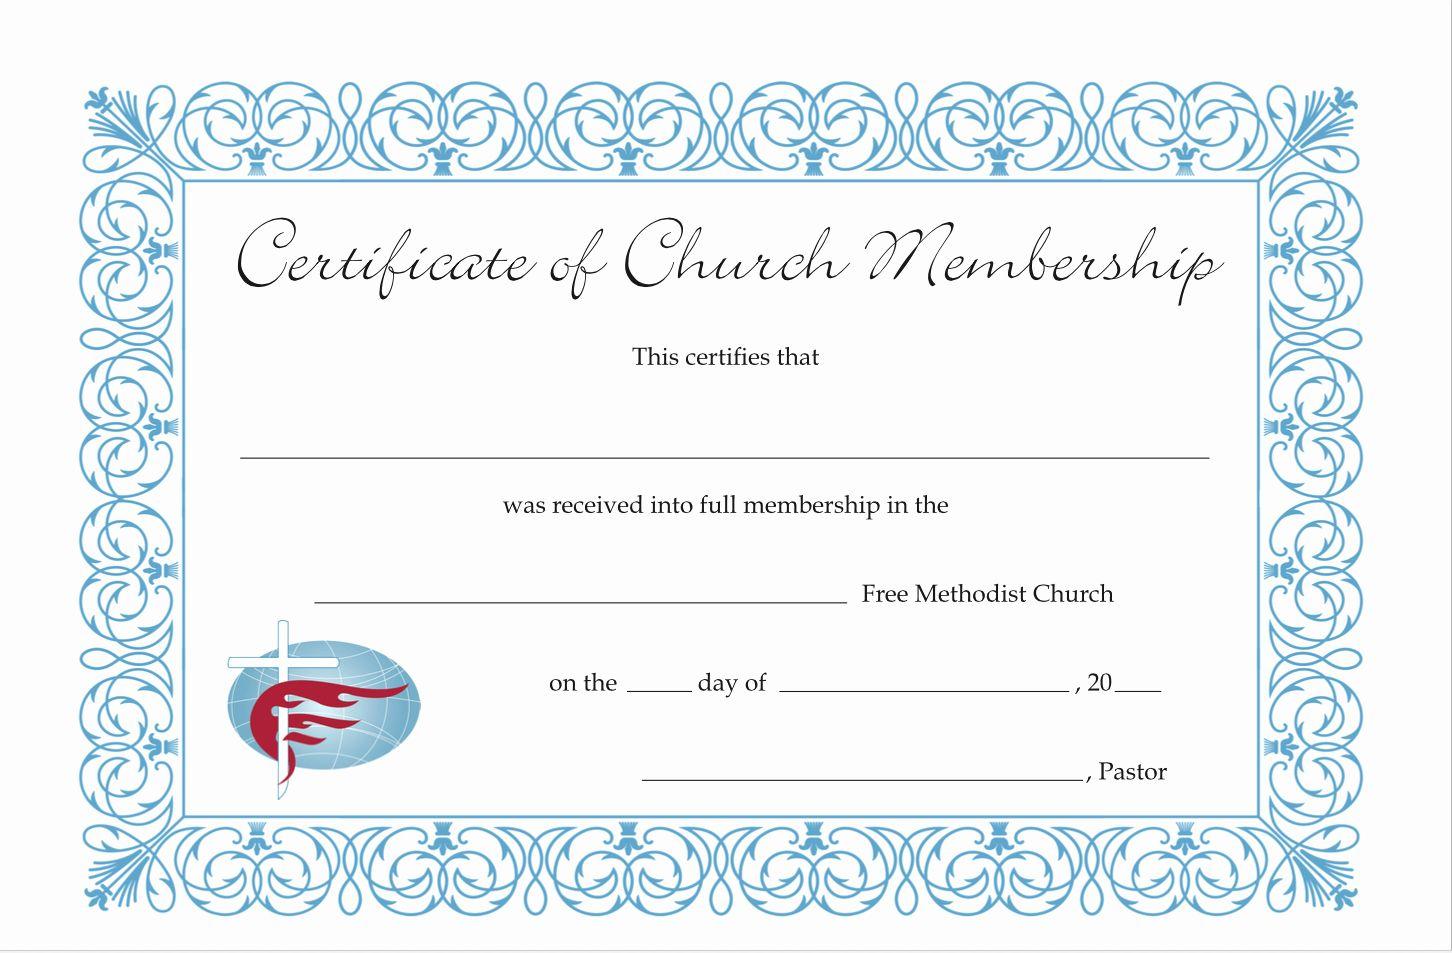 The Interesting 30 Llc Membership Certificate Template Pryncepality Pertaining To Llc Certificate Templates Certificate Of Participation Template Certificate Llc membership certificate template free